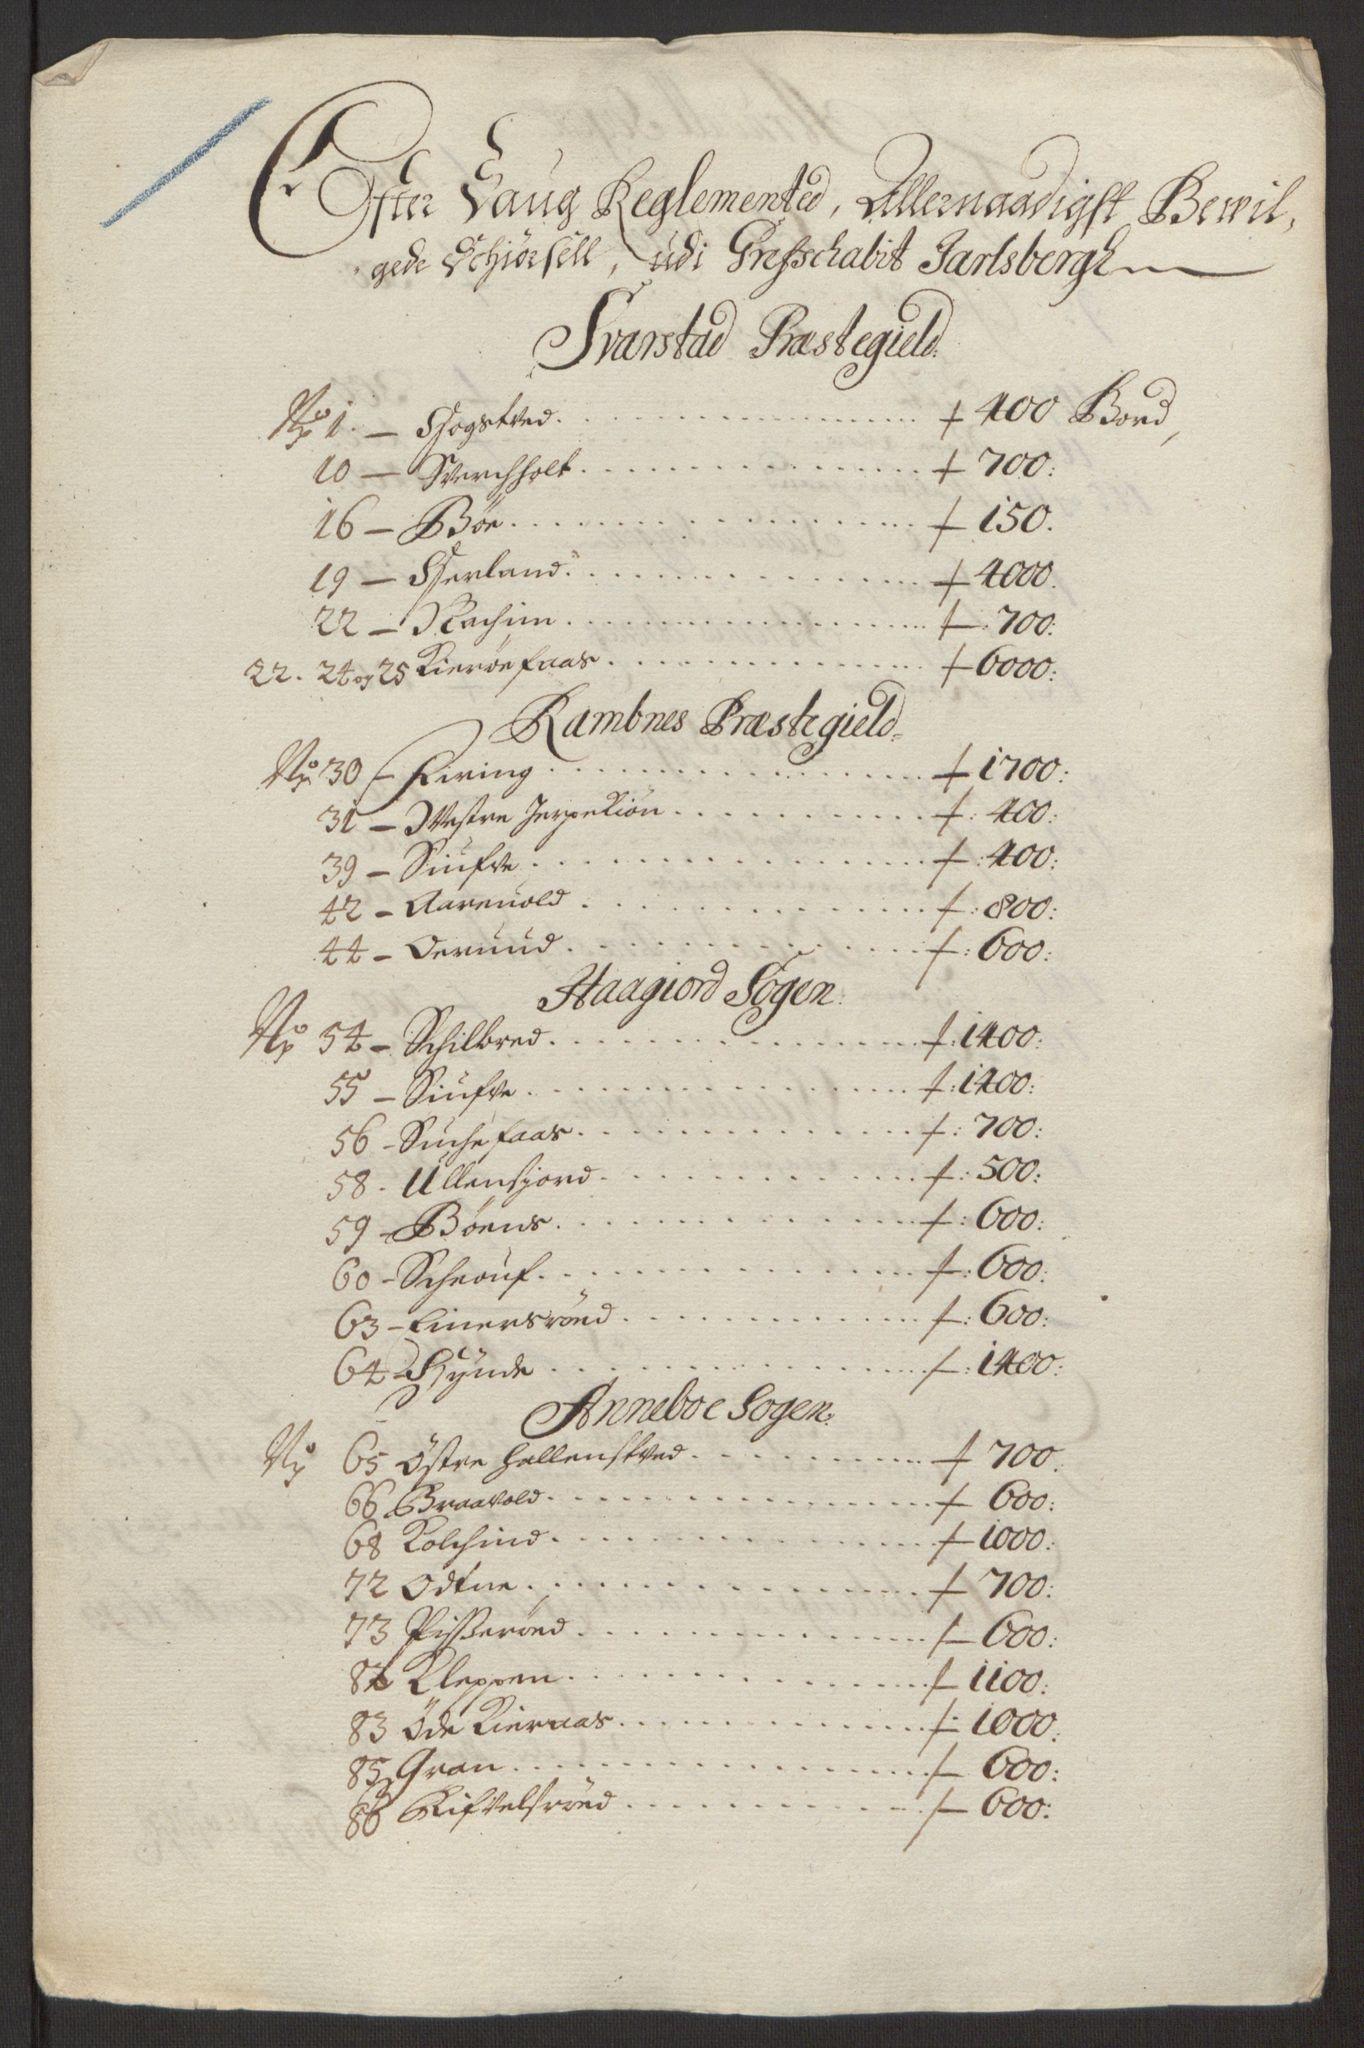 RA, Rentekammeret inntil 1814, Reviderte regnskaper, Fogderegnskap, R32/L1866: Fogderegnskap Jarlsberg grevskap, 1693, s. 385